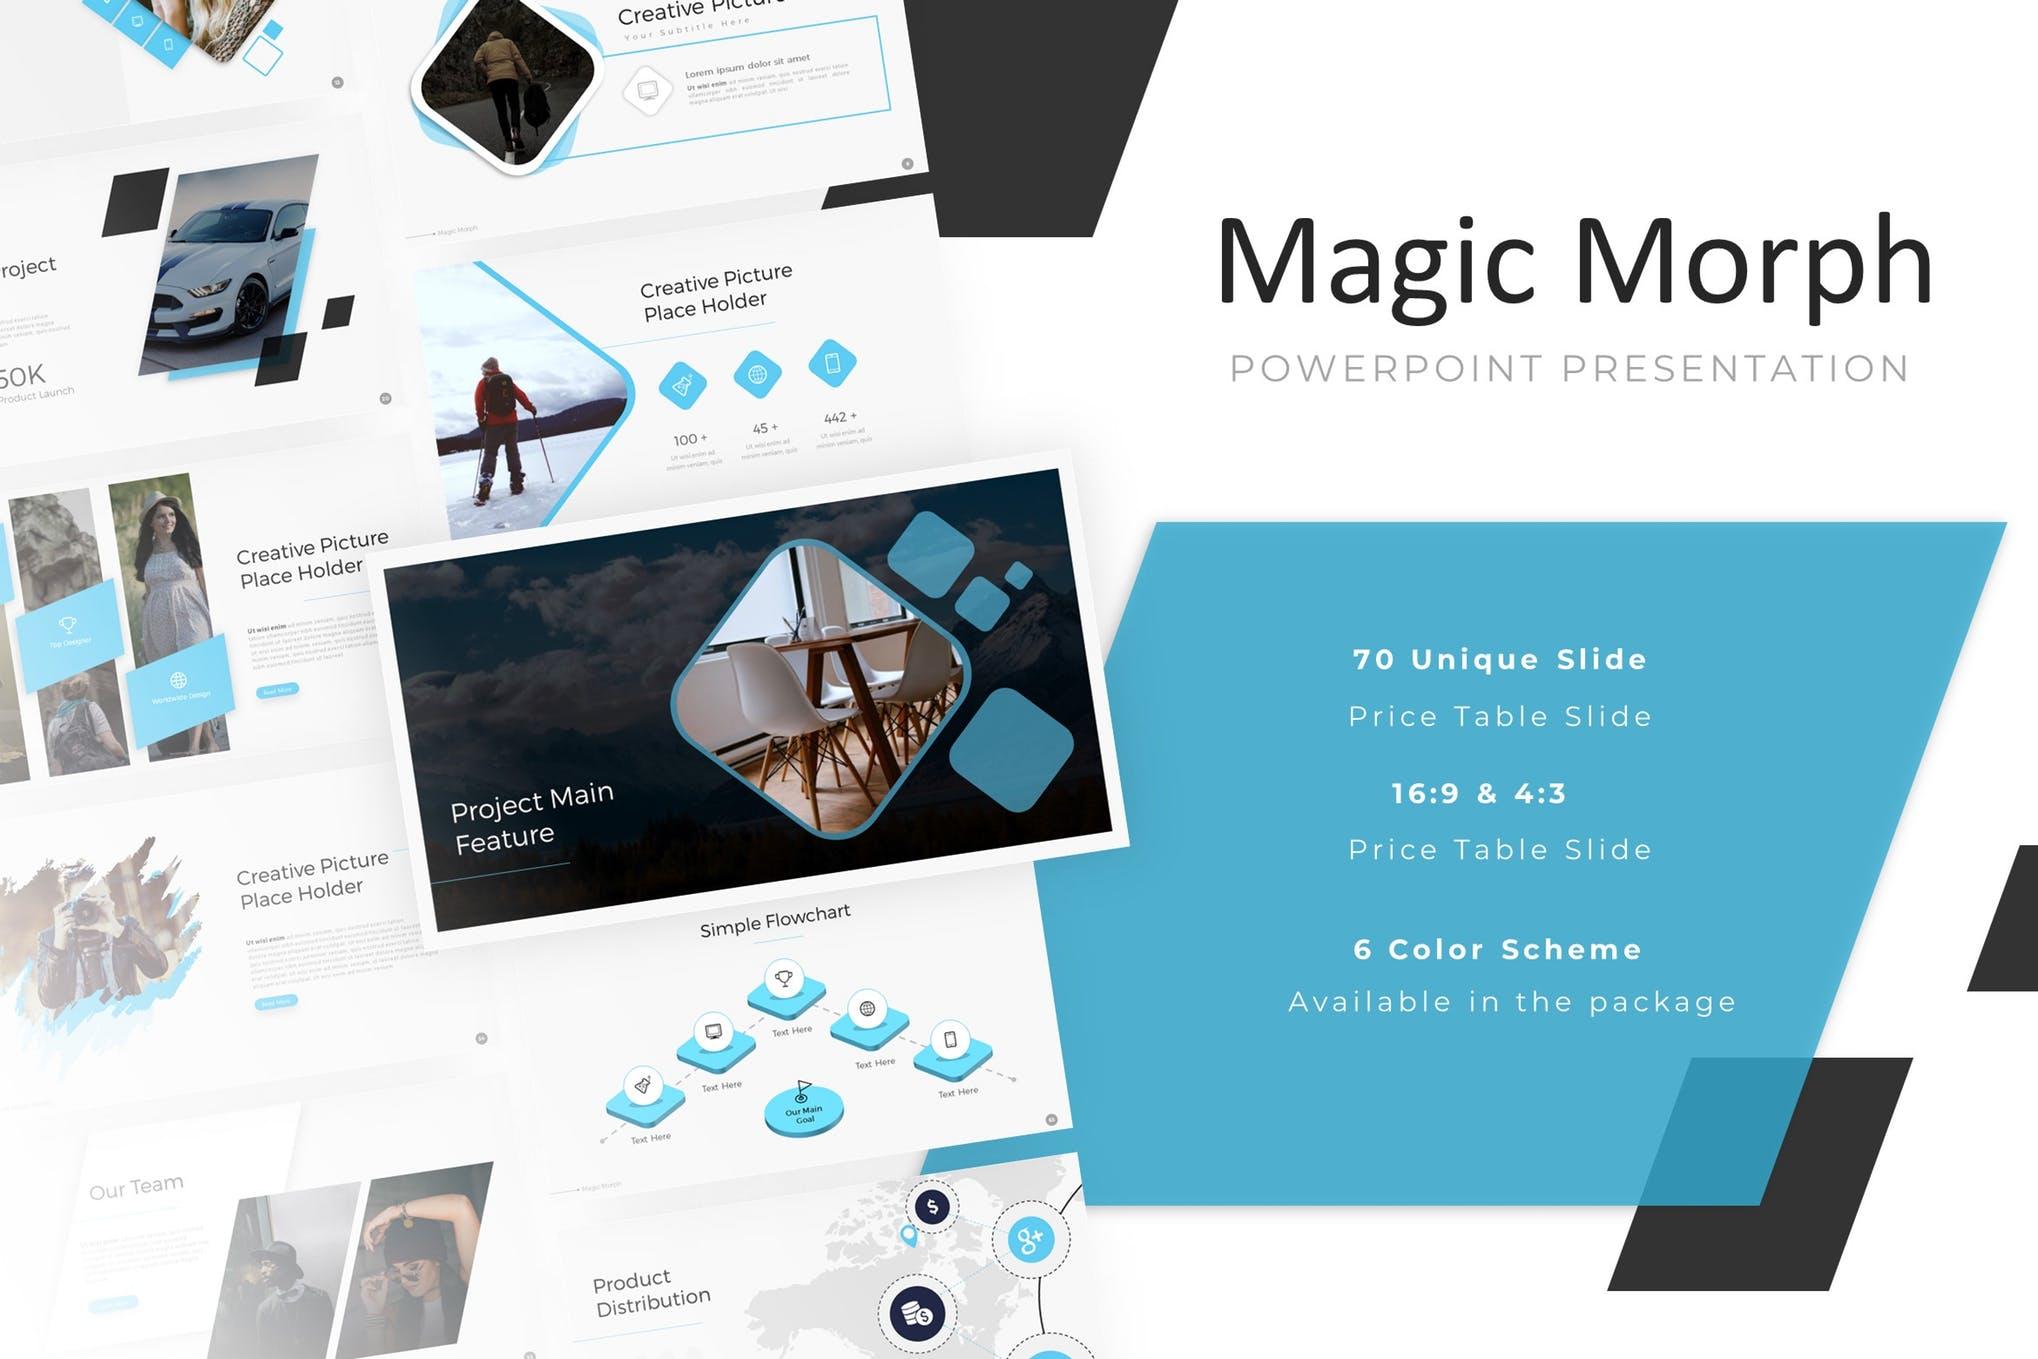 Magic Morph PowerPoint Presentation Template